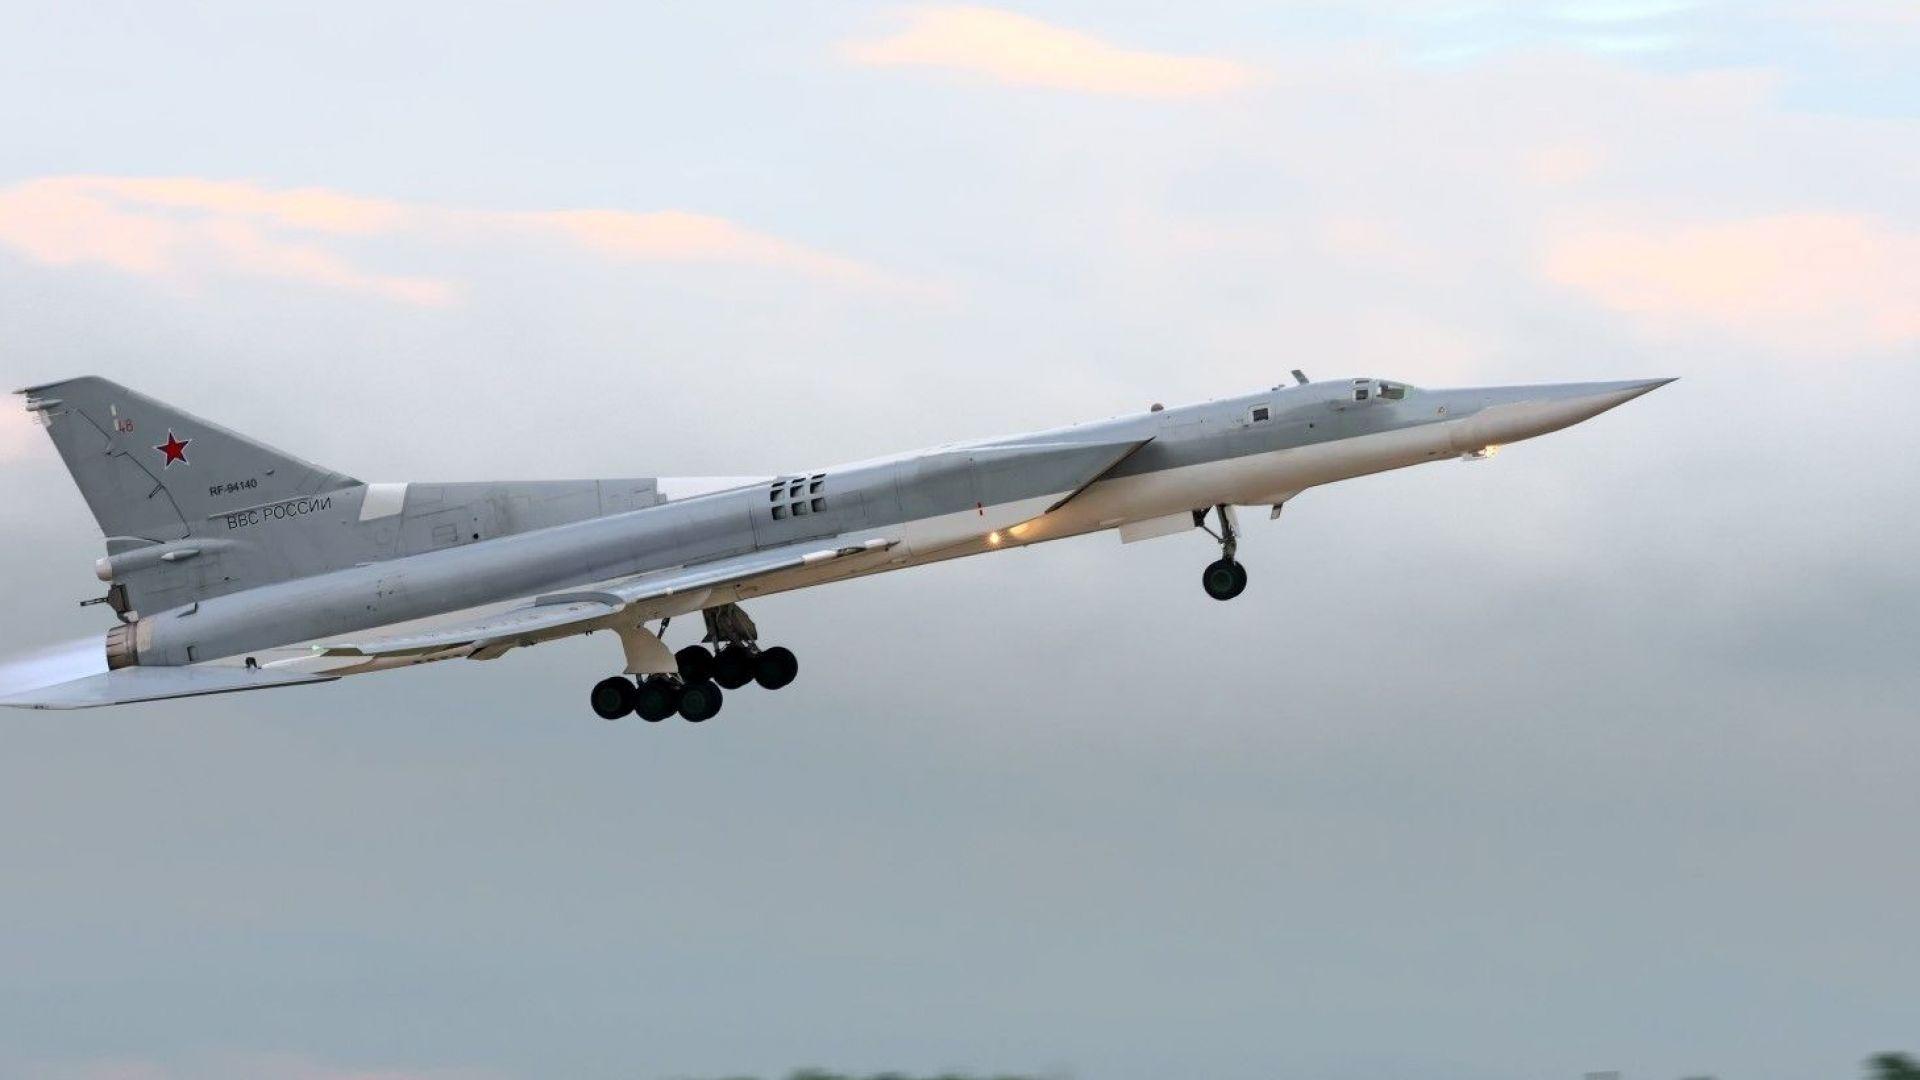 Руски бомбардировачи тренирали атака срещу норвежки радар?